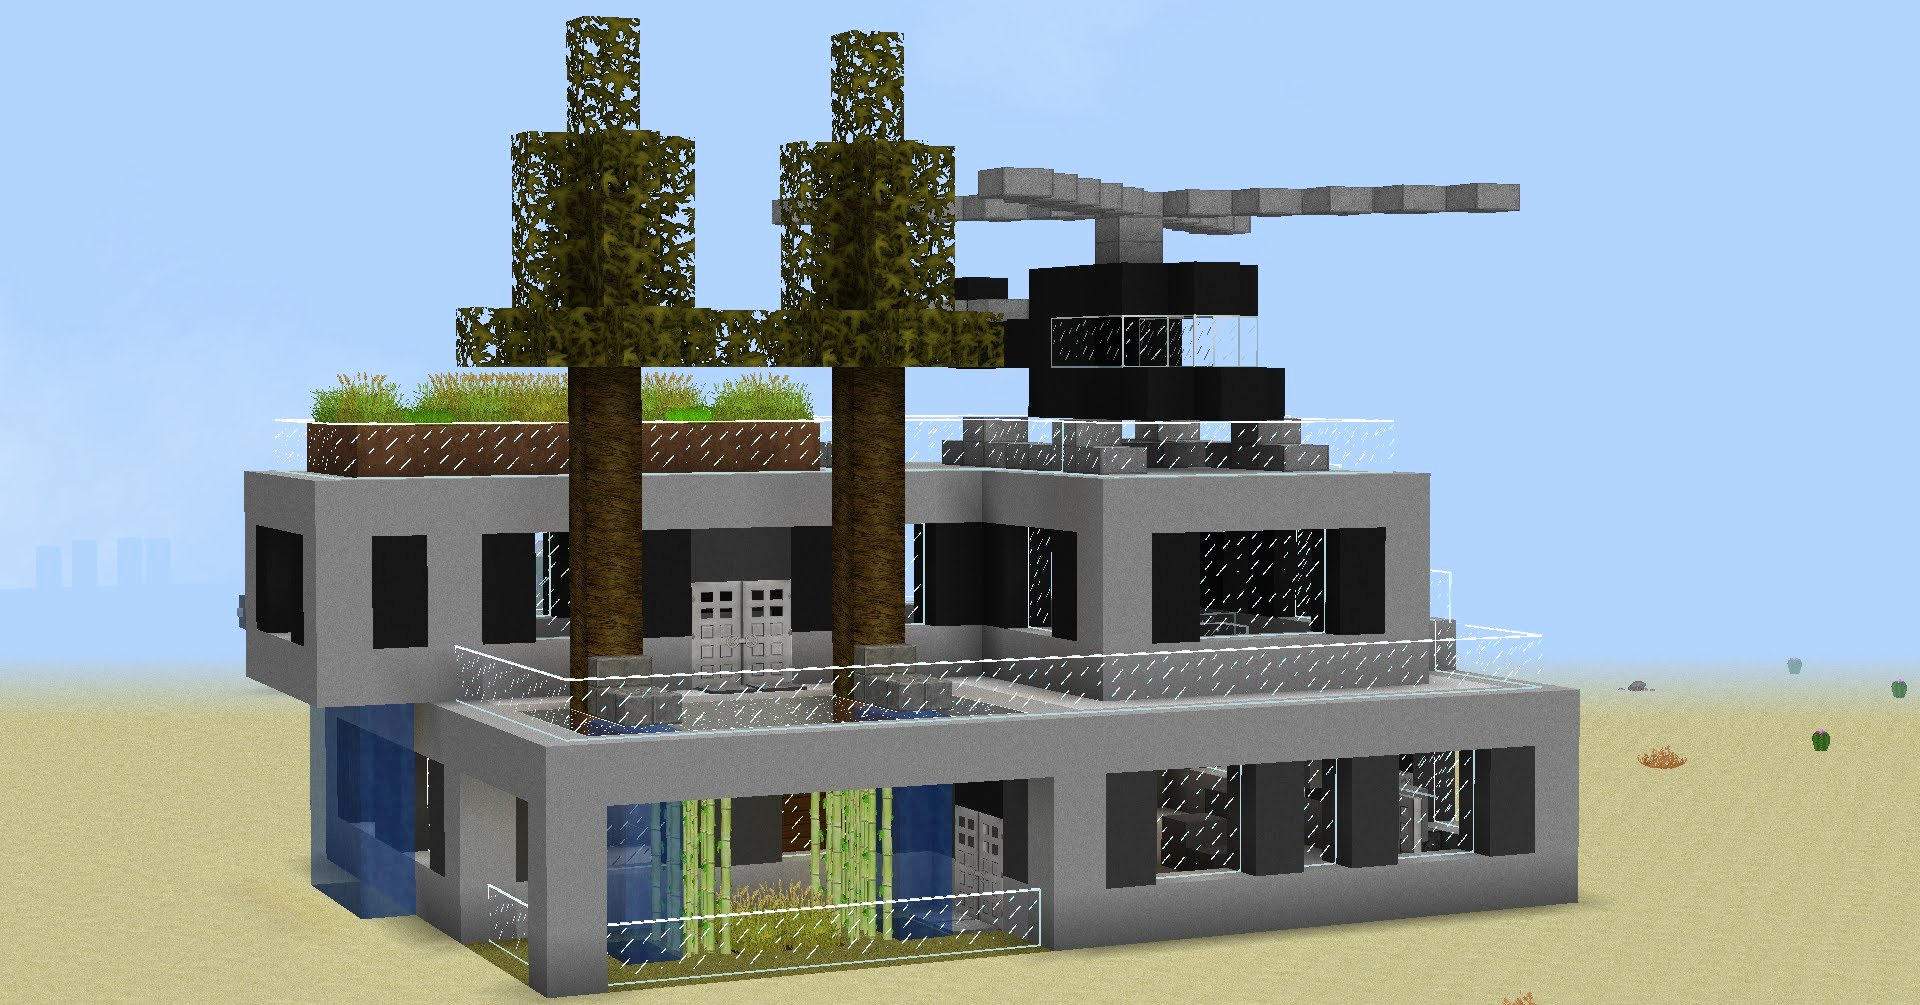 Meuble Moderne Minecraft Beau Galerie Maison Moderne Minecraft Plan Beau Awesome Maison Moderne De Luxe